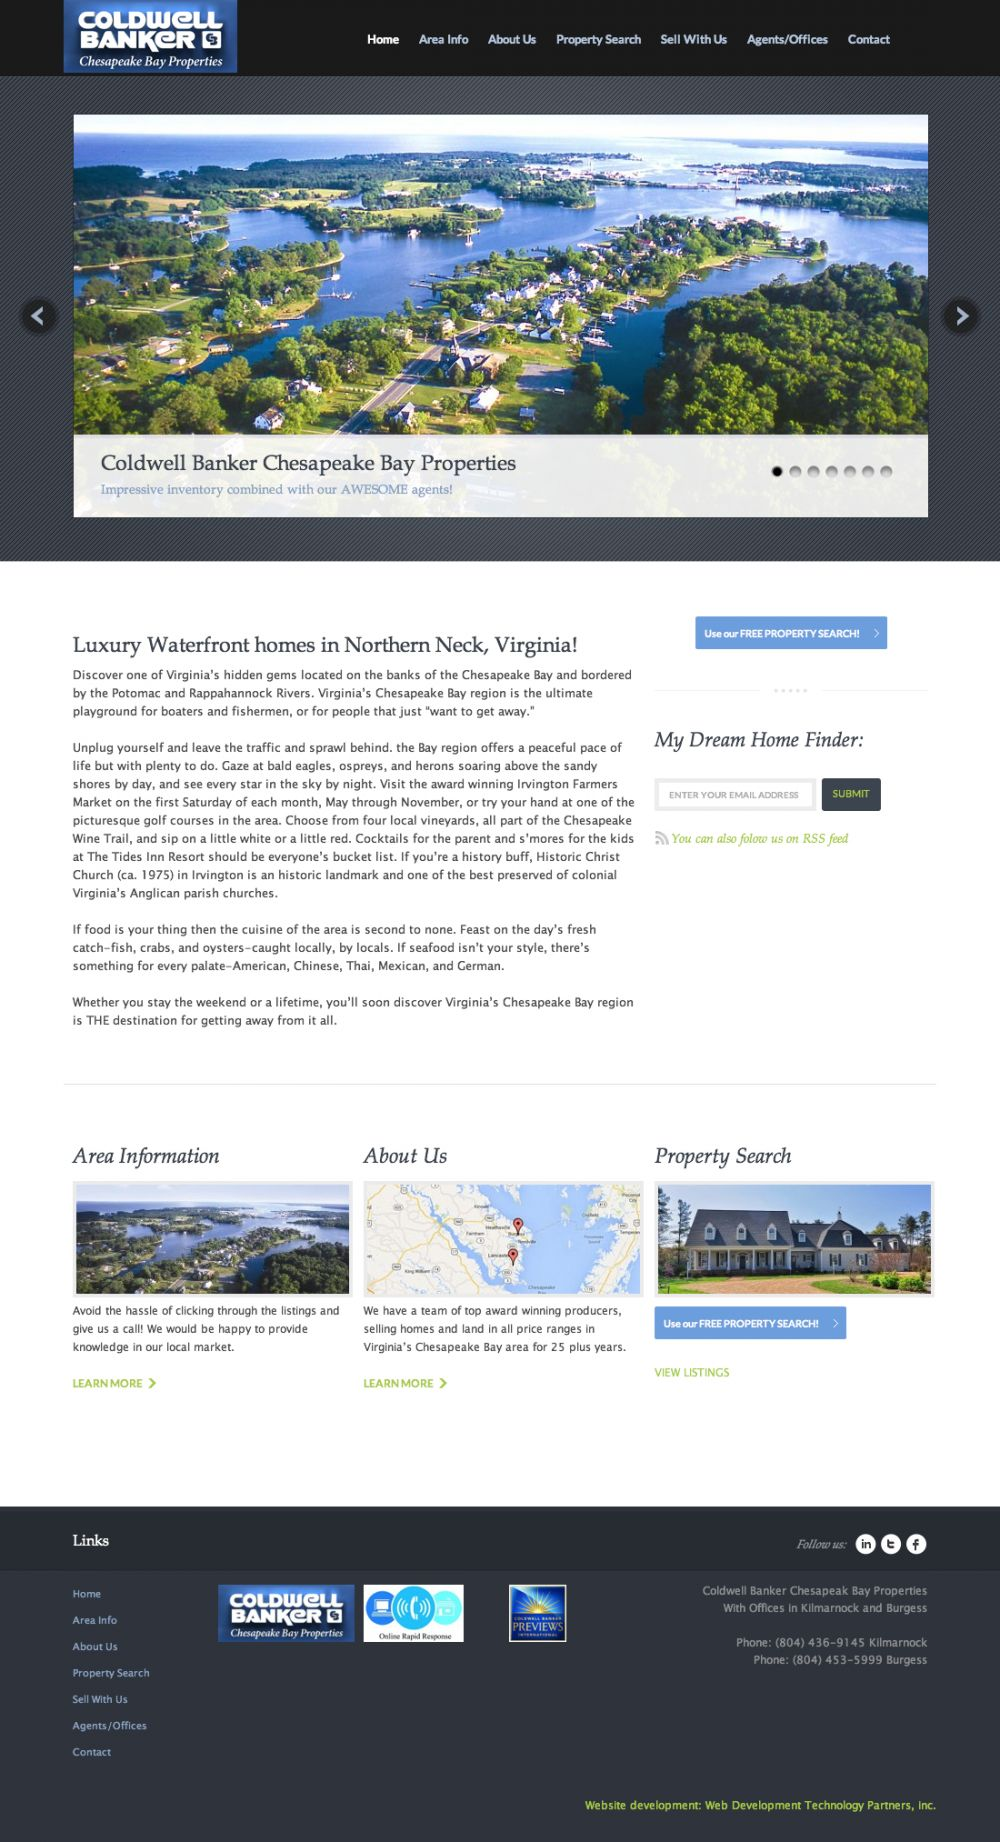 Coldwell Banker Chesapeake Bay Properties